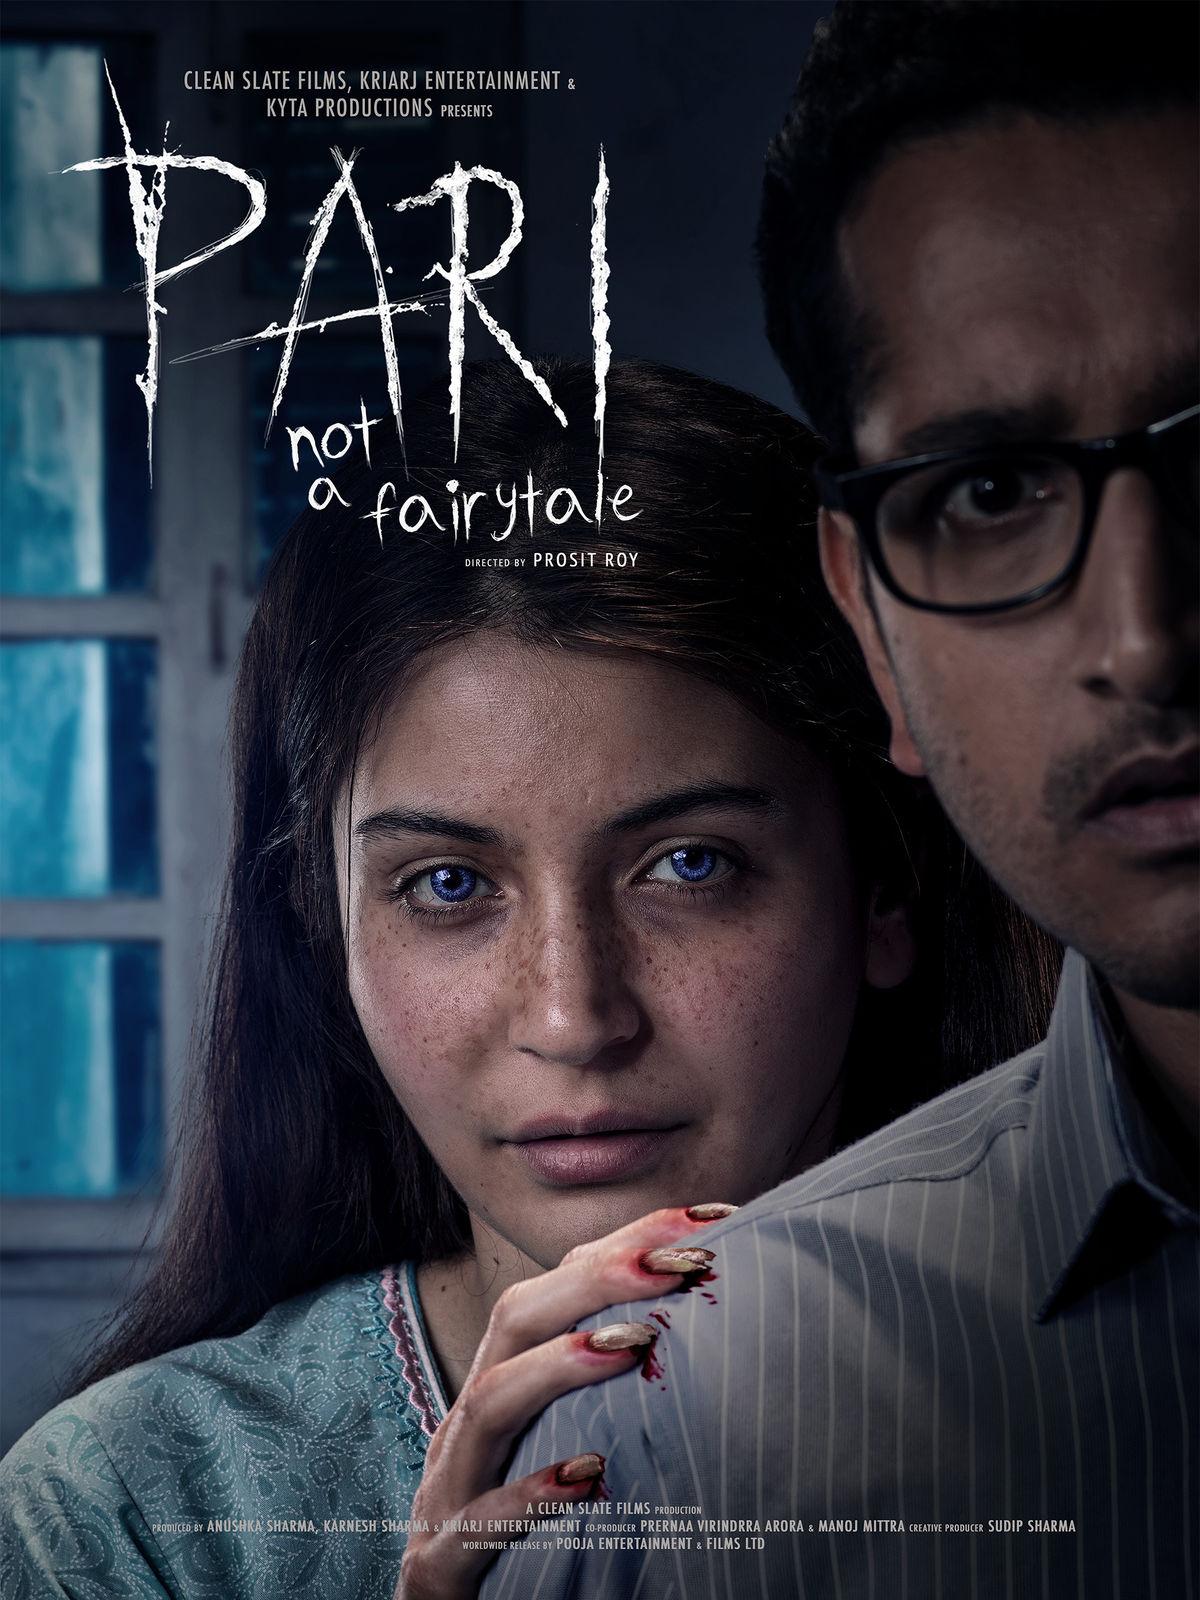 Best Mystery movies in Urdu